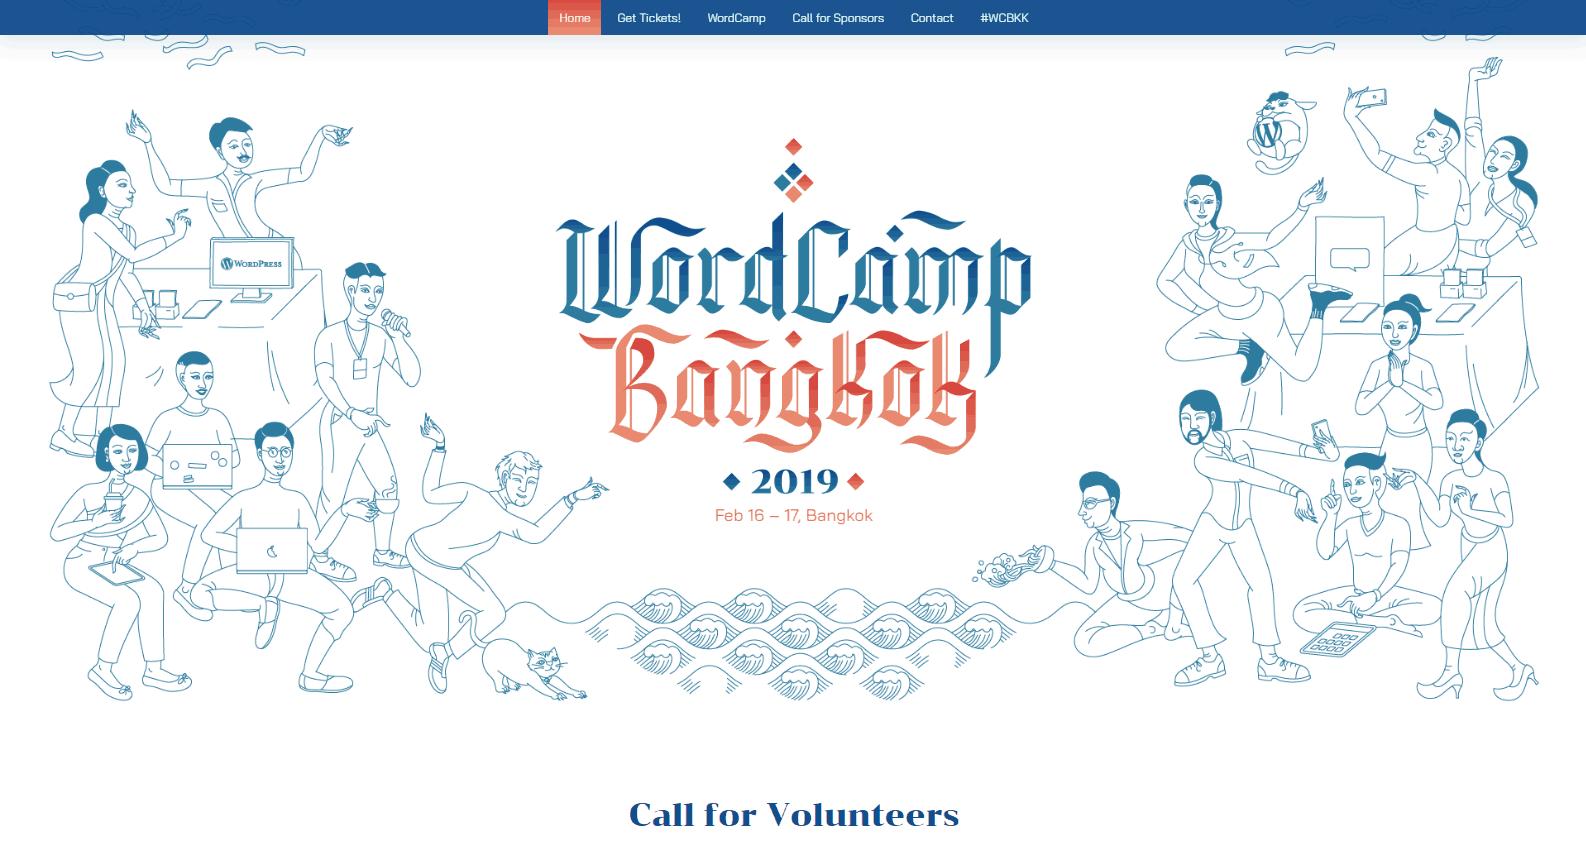 WordPress events: The WordCamp Bangkok website.